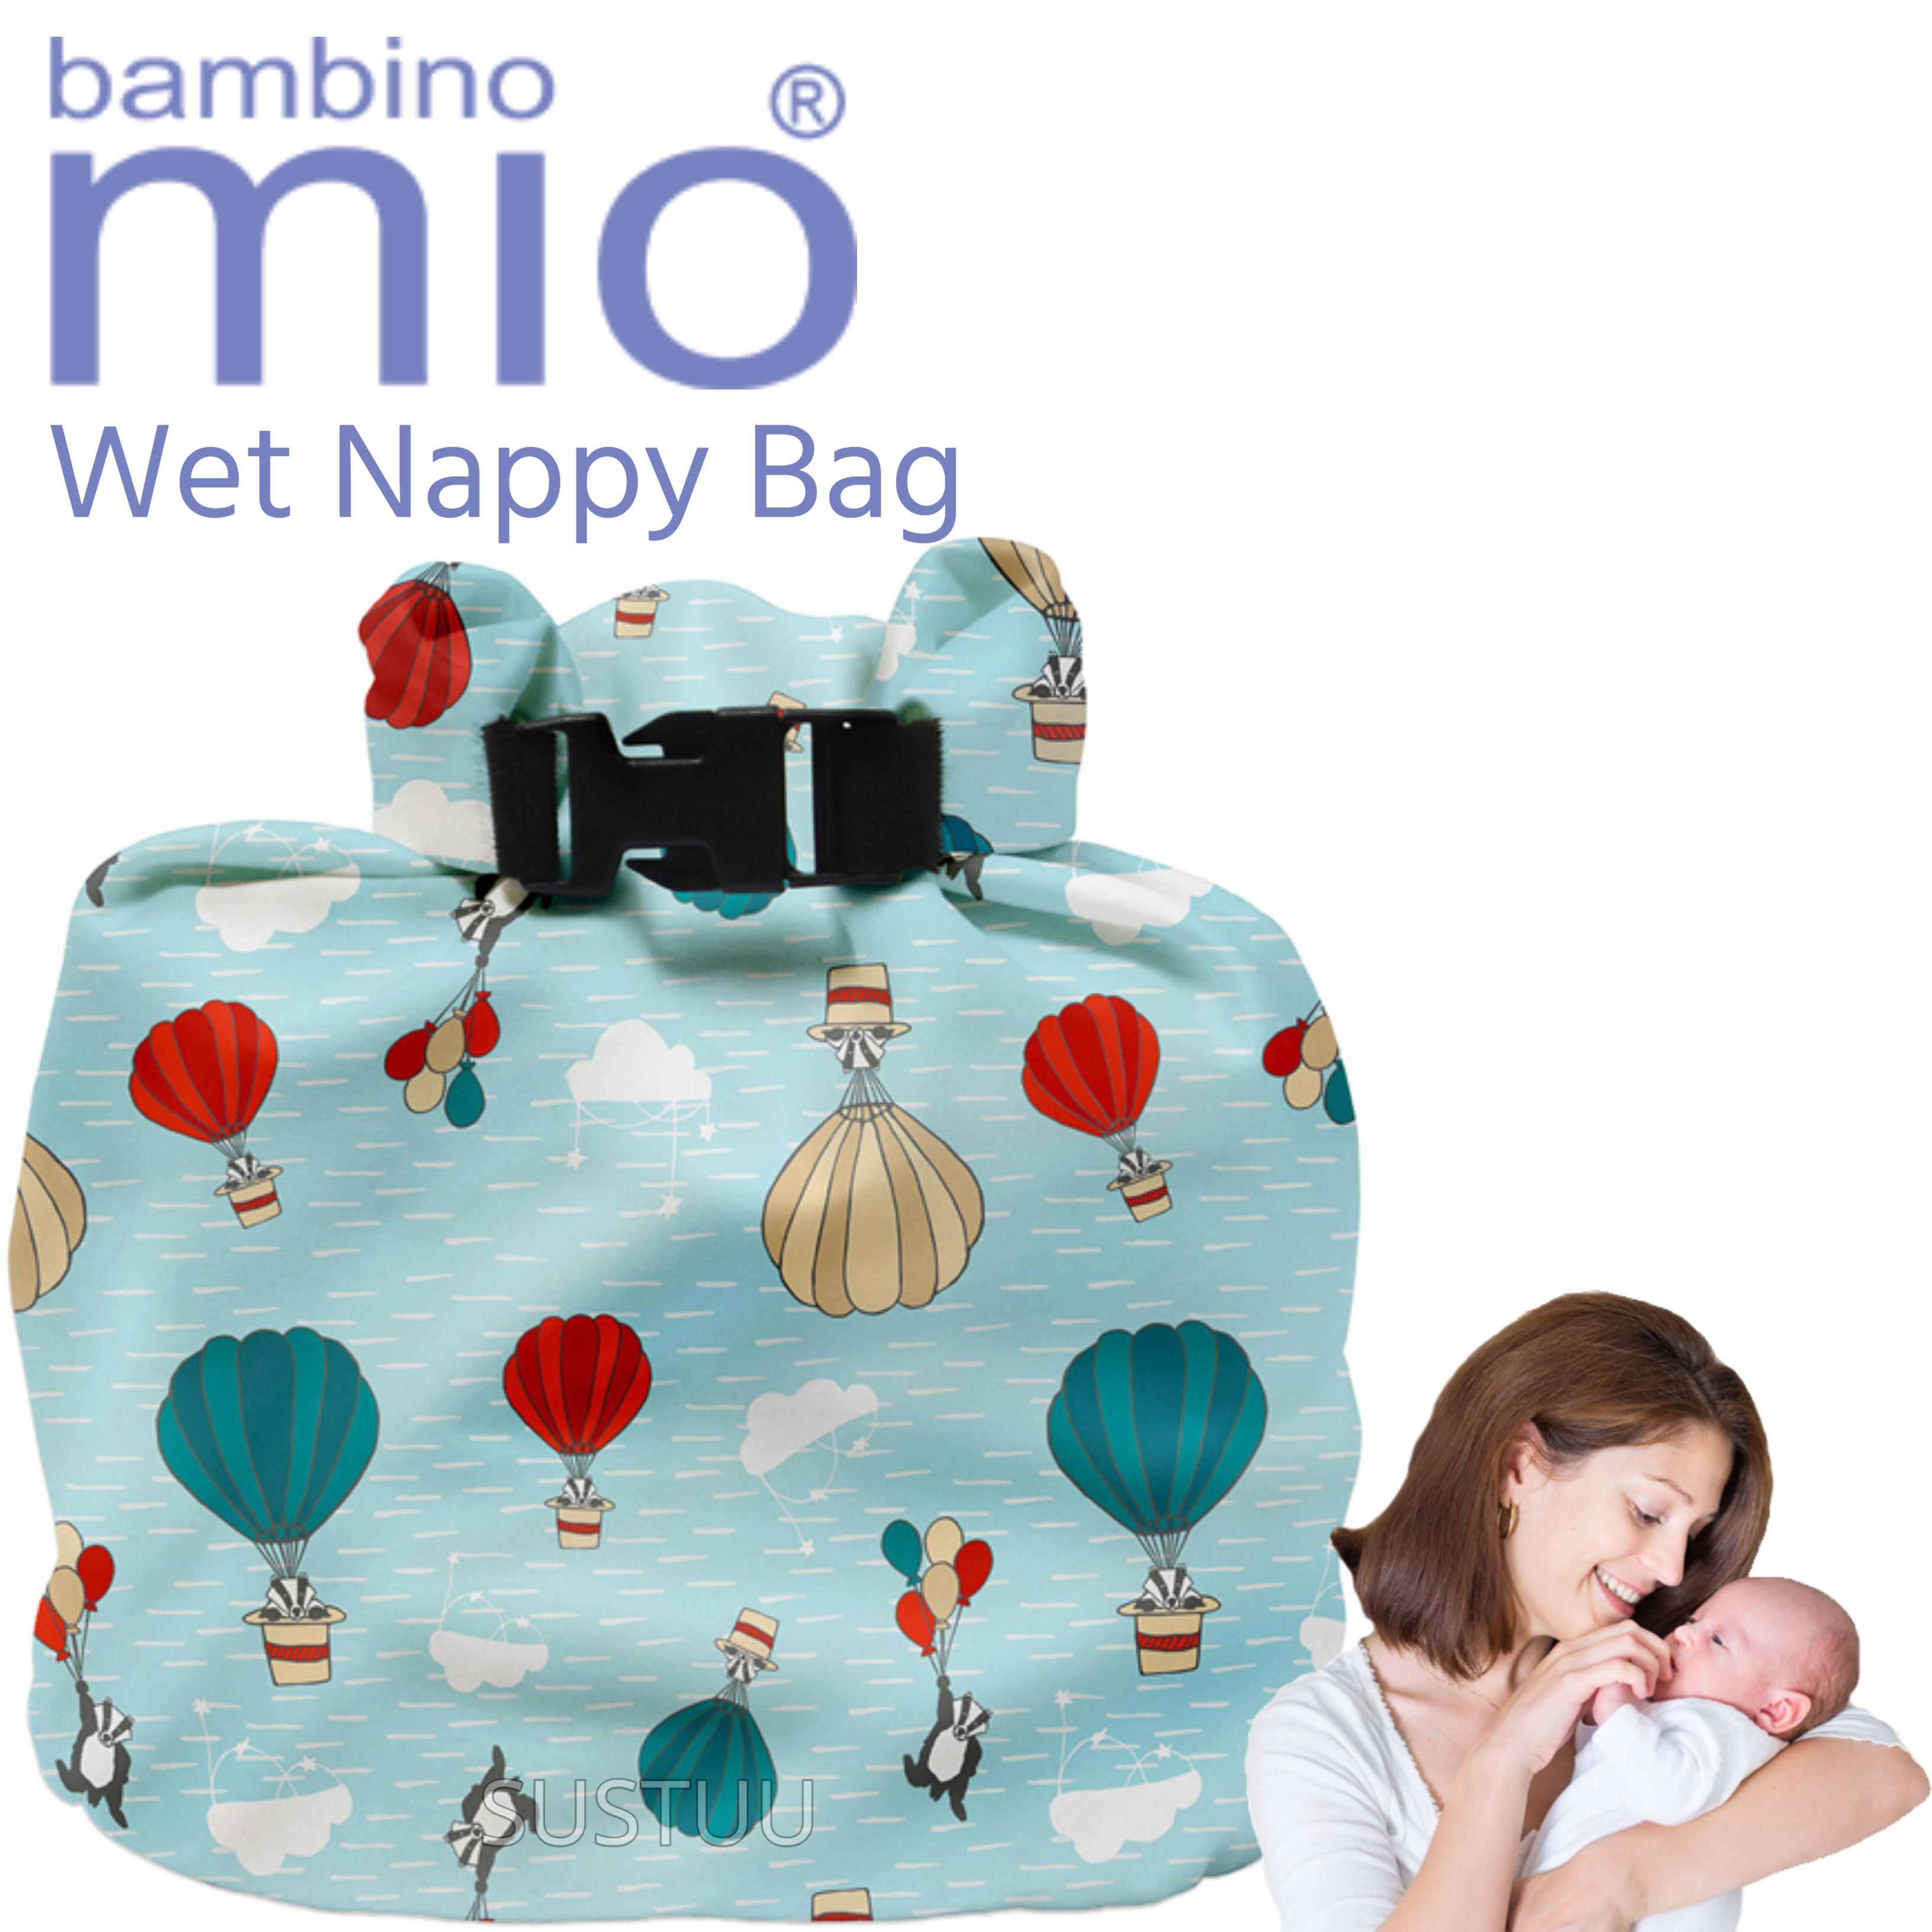 New Bambino Mio Wet Nappy Bag Sky Ride|Simple Fold|Roll Closure|4 Nappy Holder